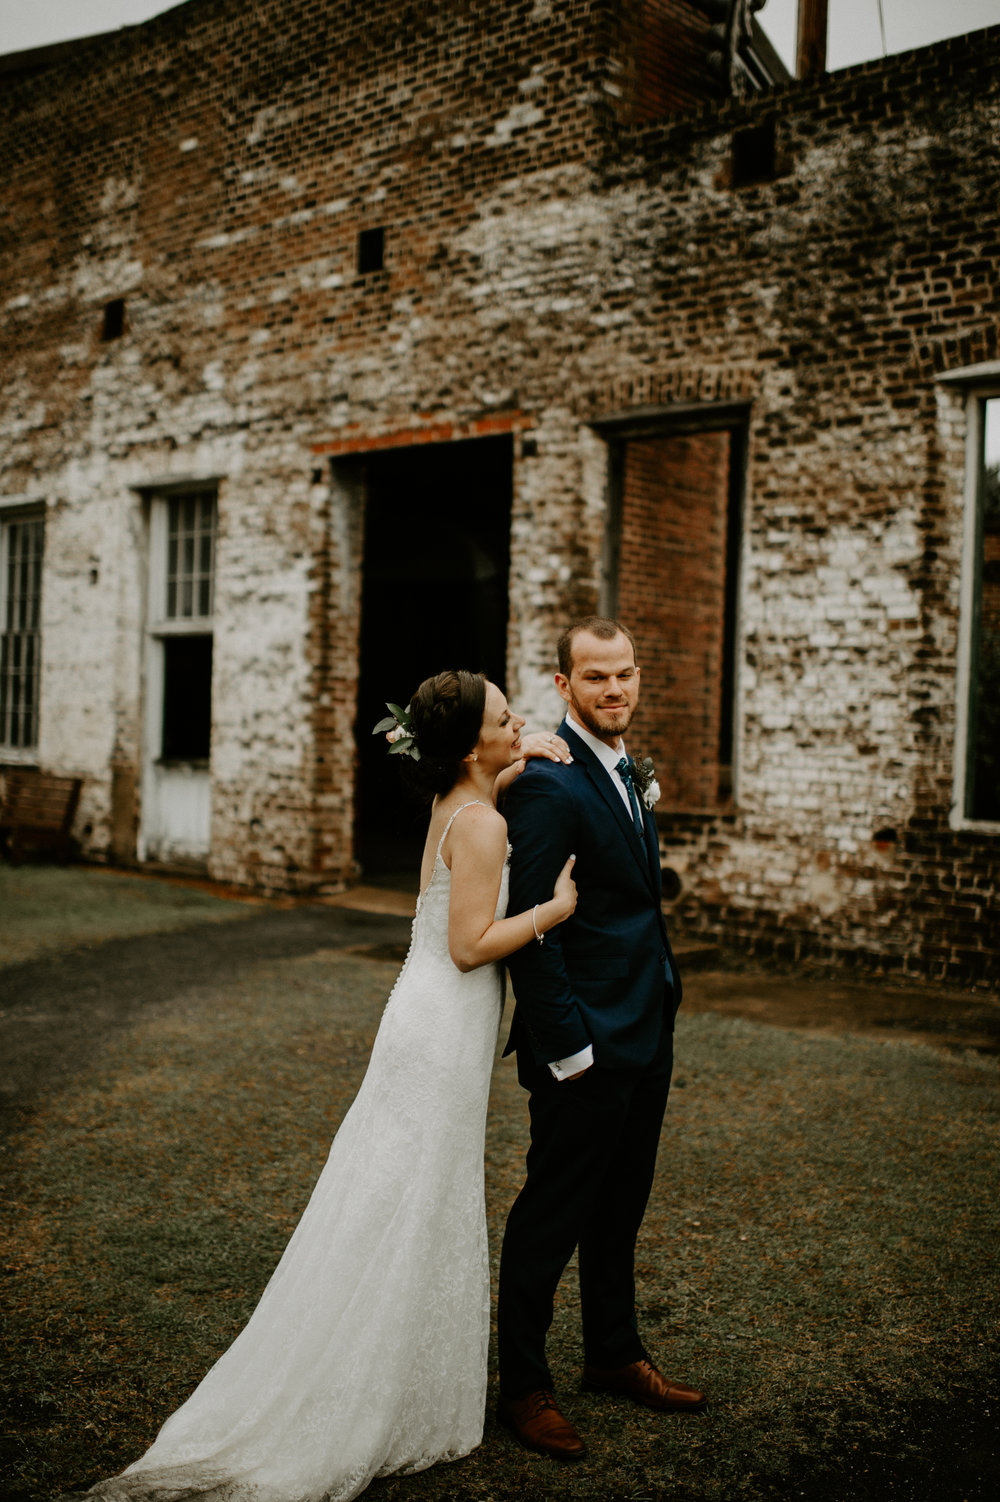 savannah-bridal-shop-andrea-and-mike-evergold-photography-georgia-state-railroad-museum-wedding-savannah-wedding-florist-savannah-wedding-planner-43.jpg